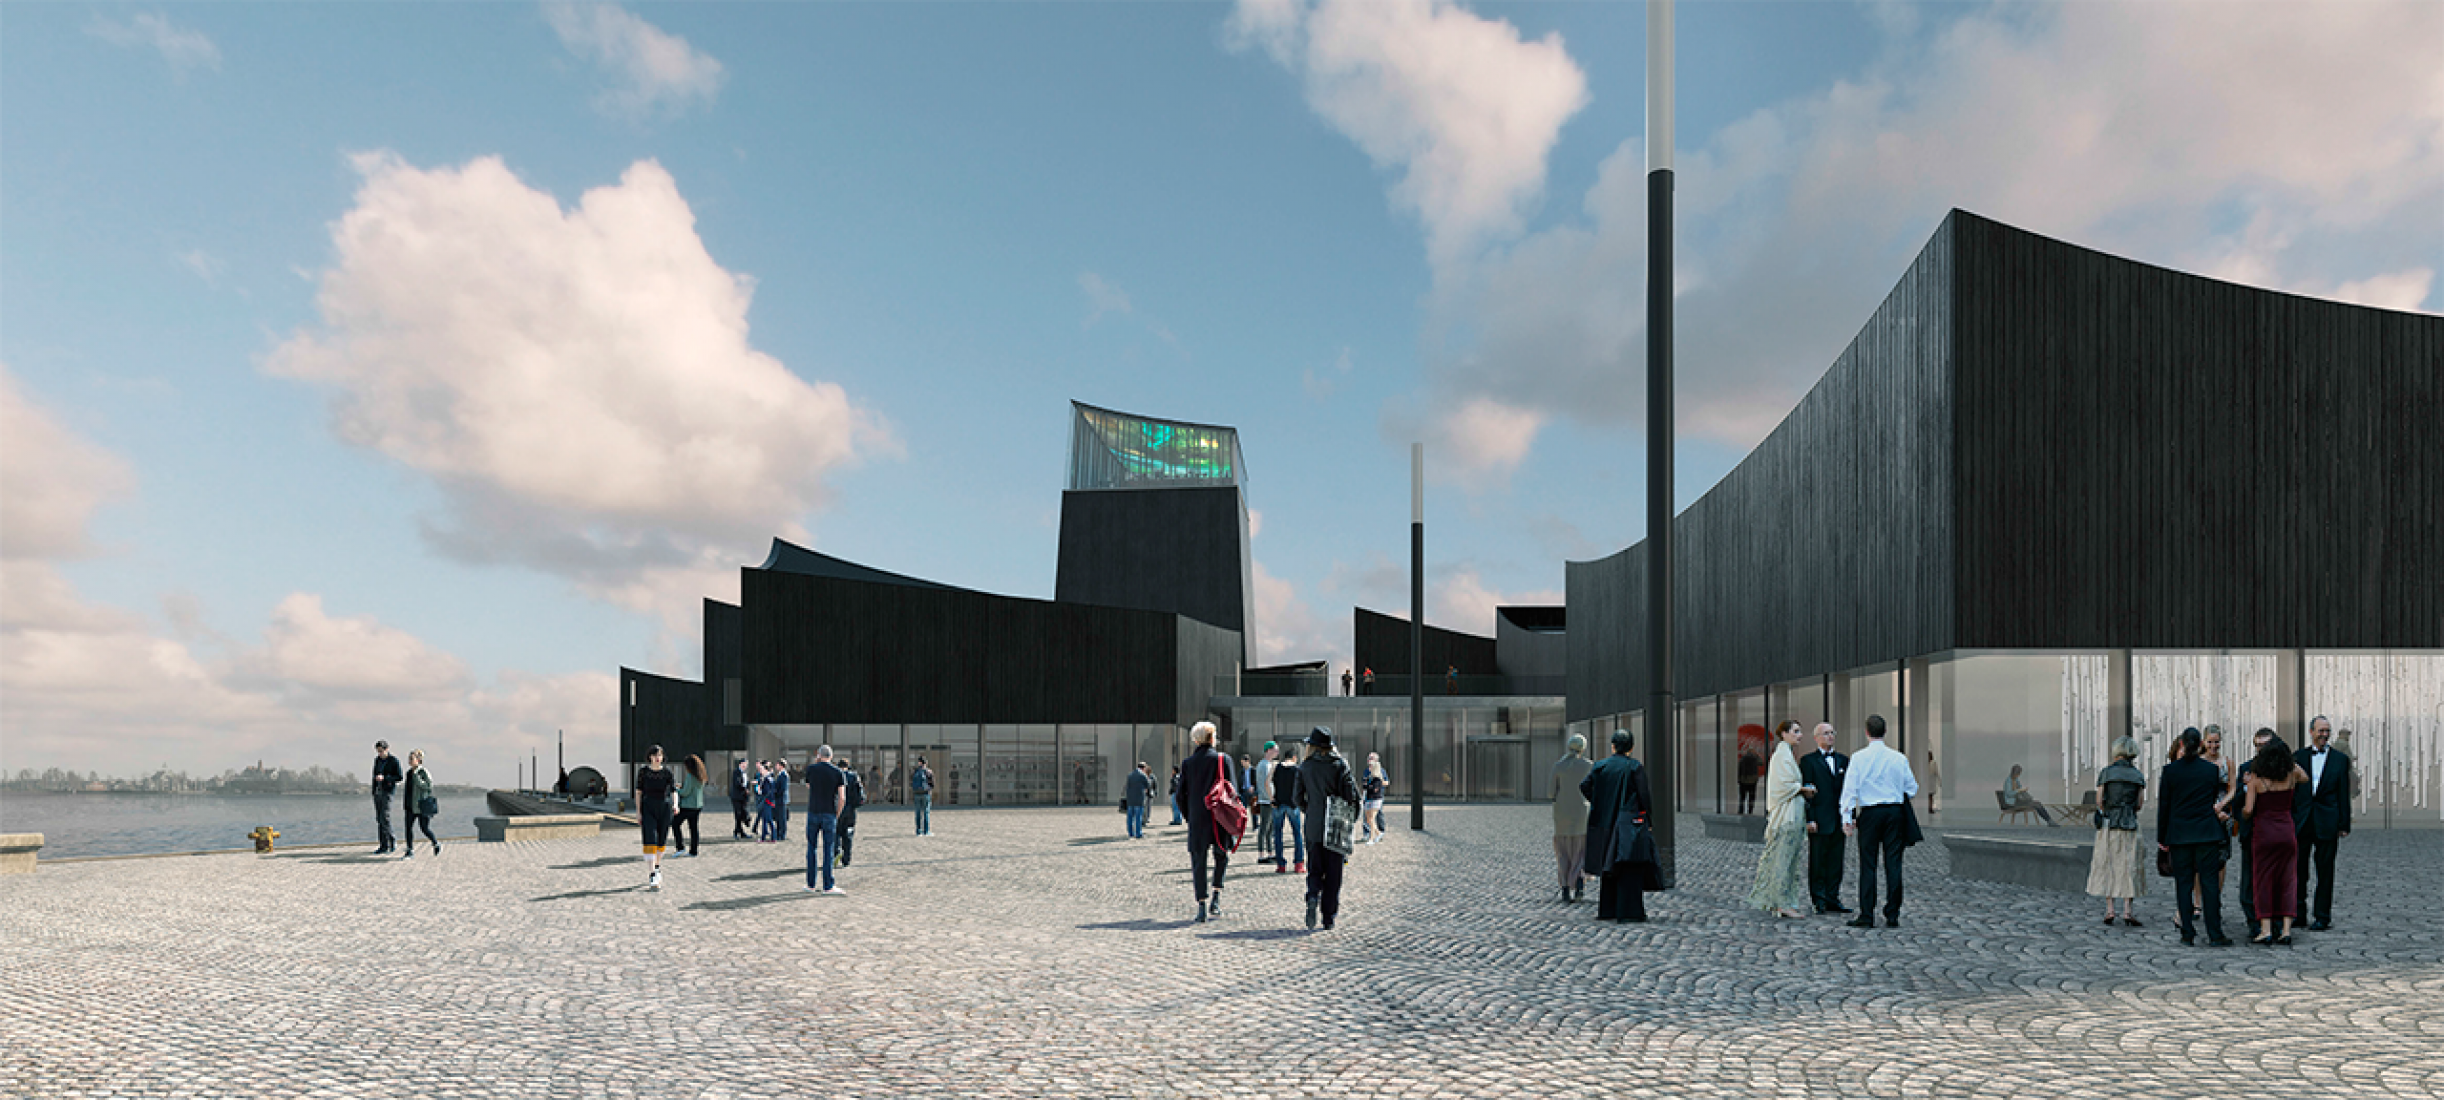 Access. Guggenheim Helsinki by Moreau Kusunoki. Image vía Guggenheim Helsinki Design Competition.